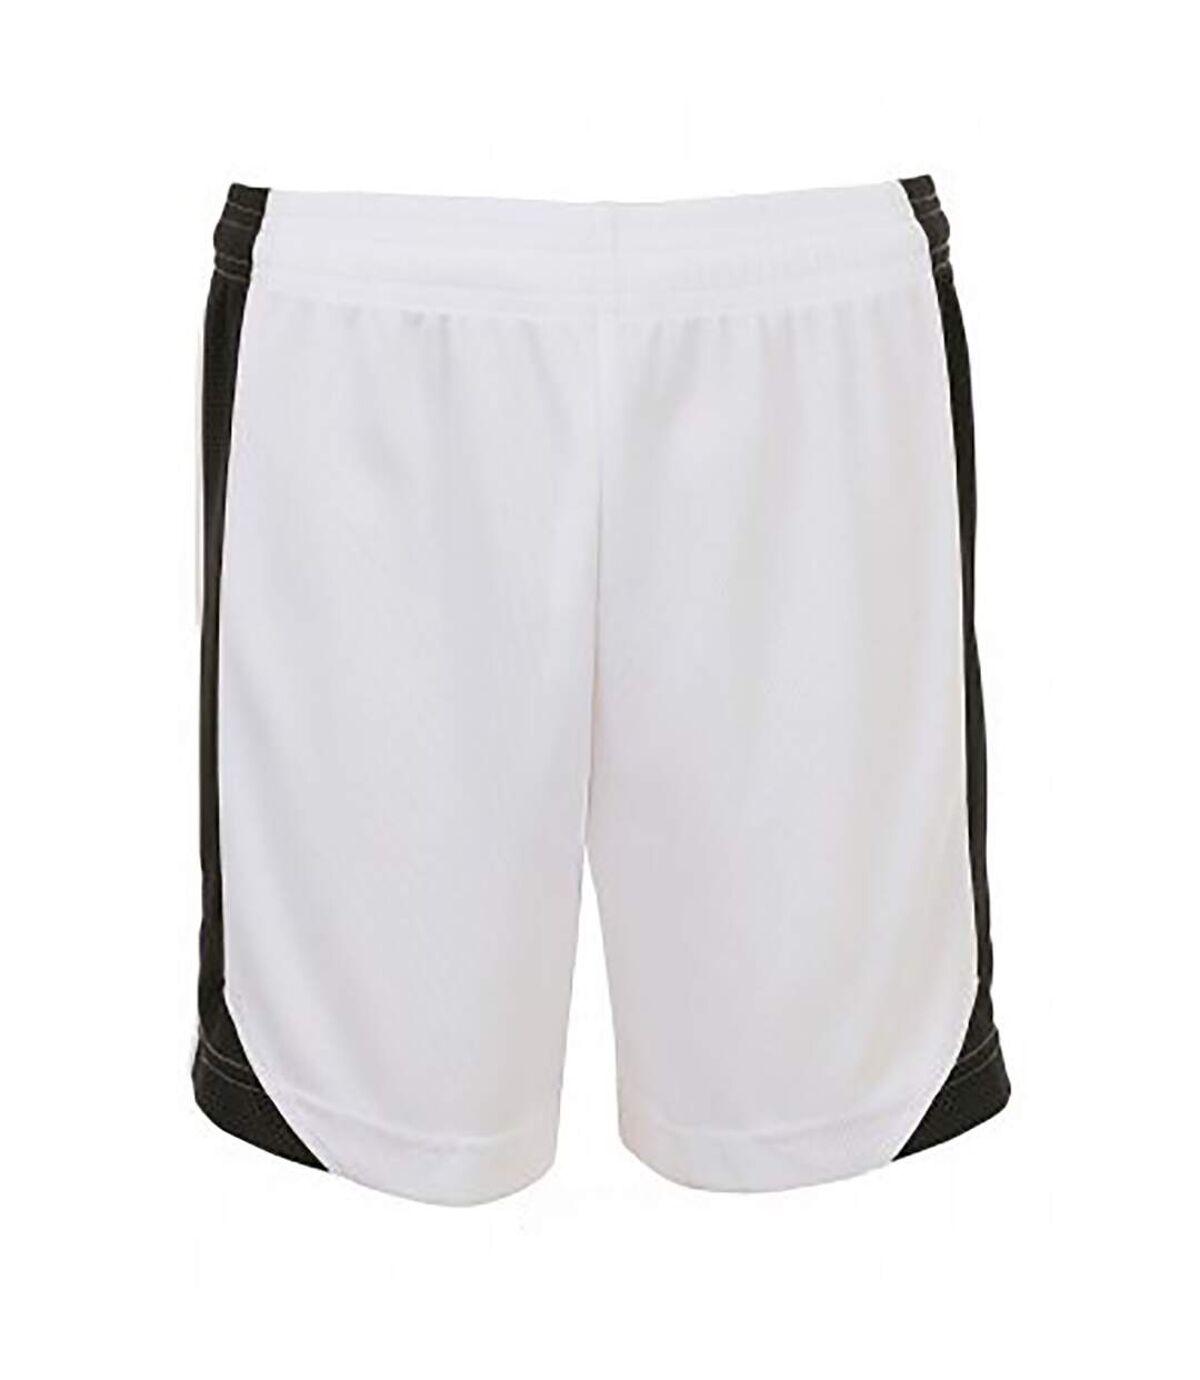 SOLS Mens Olimpico Football Shorts (White/Black) - UTPC2788